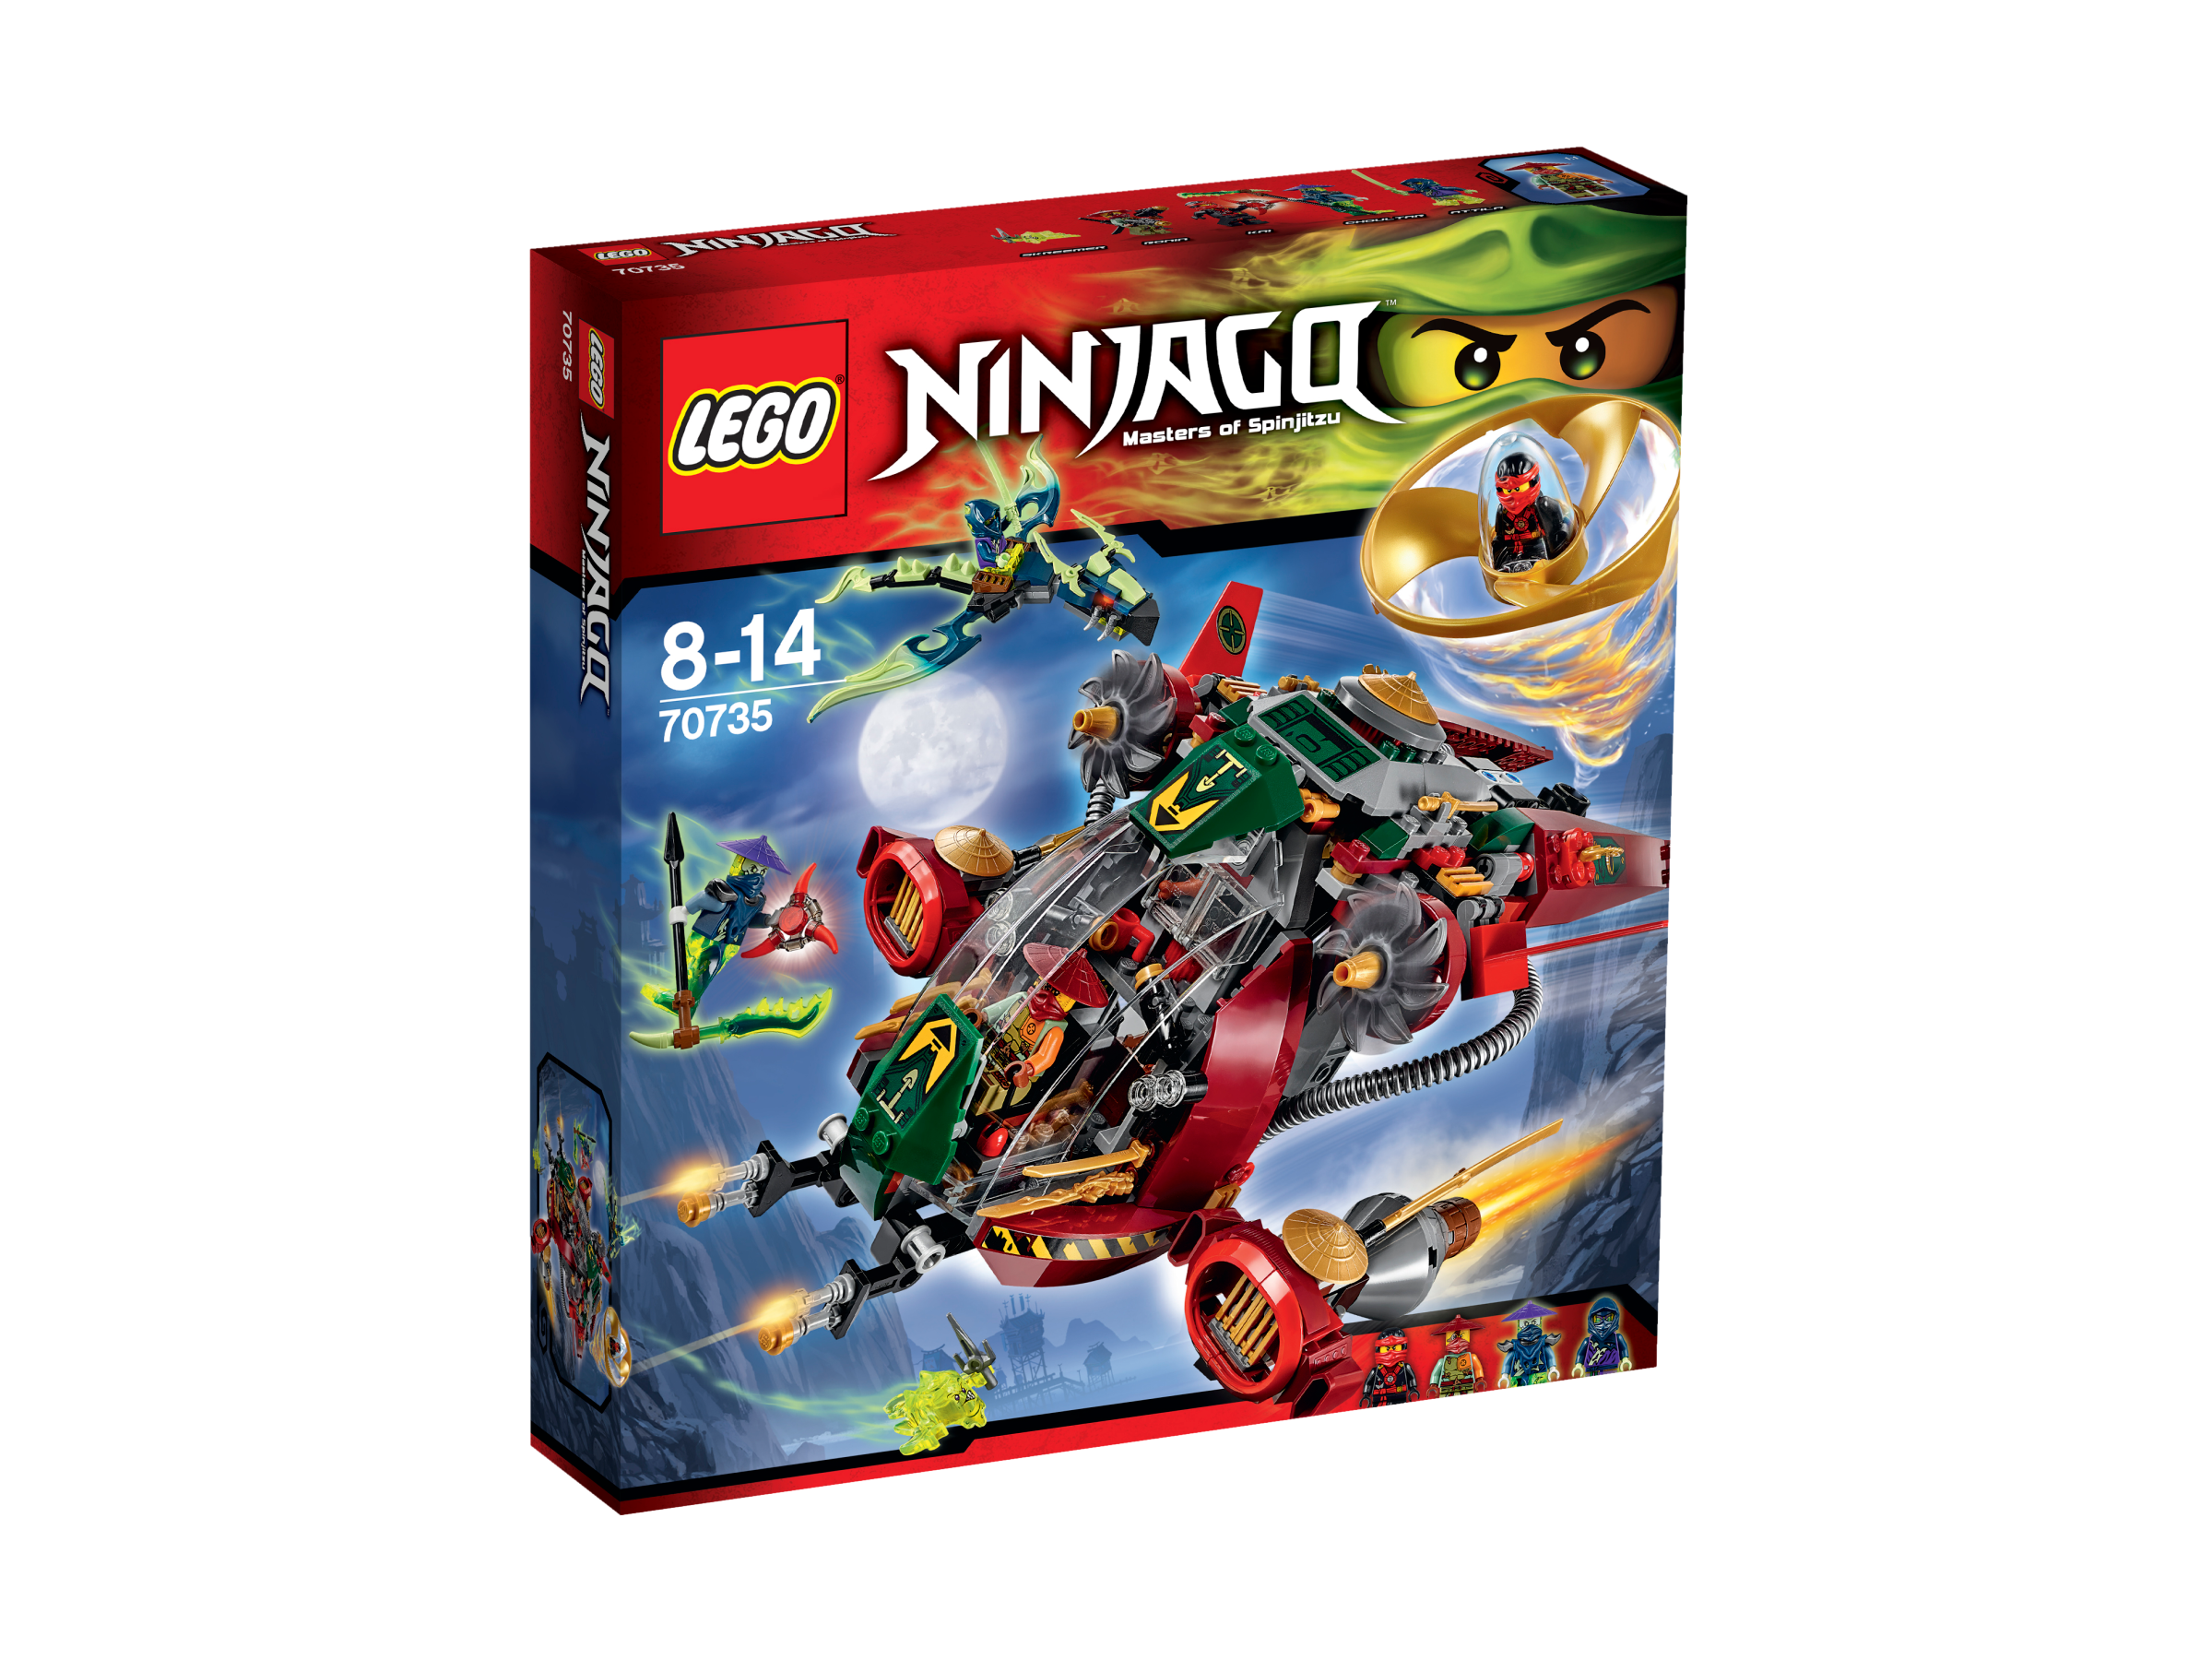 Le Jet hybride de Ronin - LEGO® NINJAGO - 70735